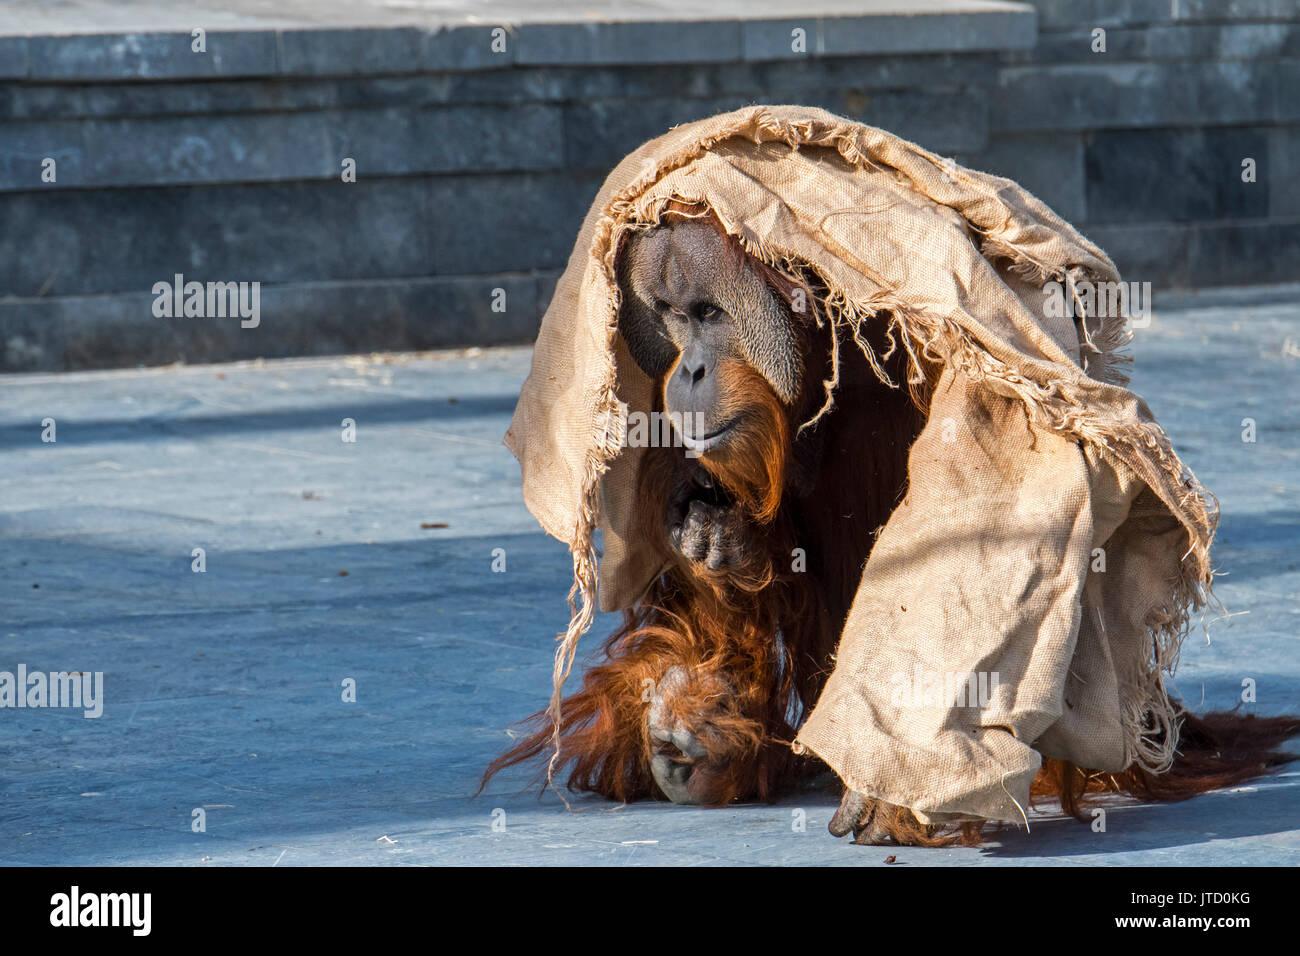 Sumatran orangutan / orang-utang (Pongo abelii) male walking around wrapped in cloth in zoo, native to Indonesian Stock Photo